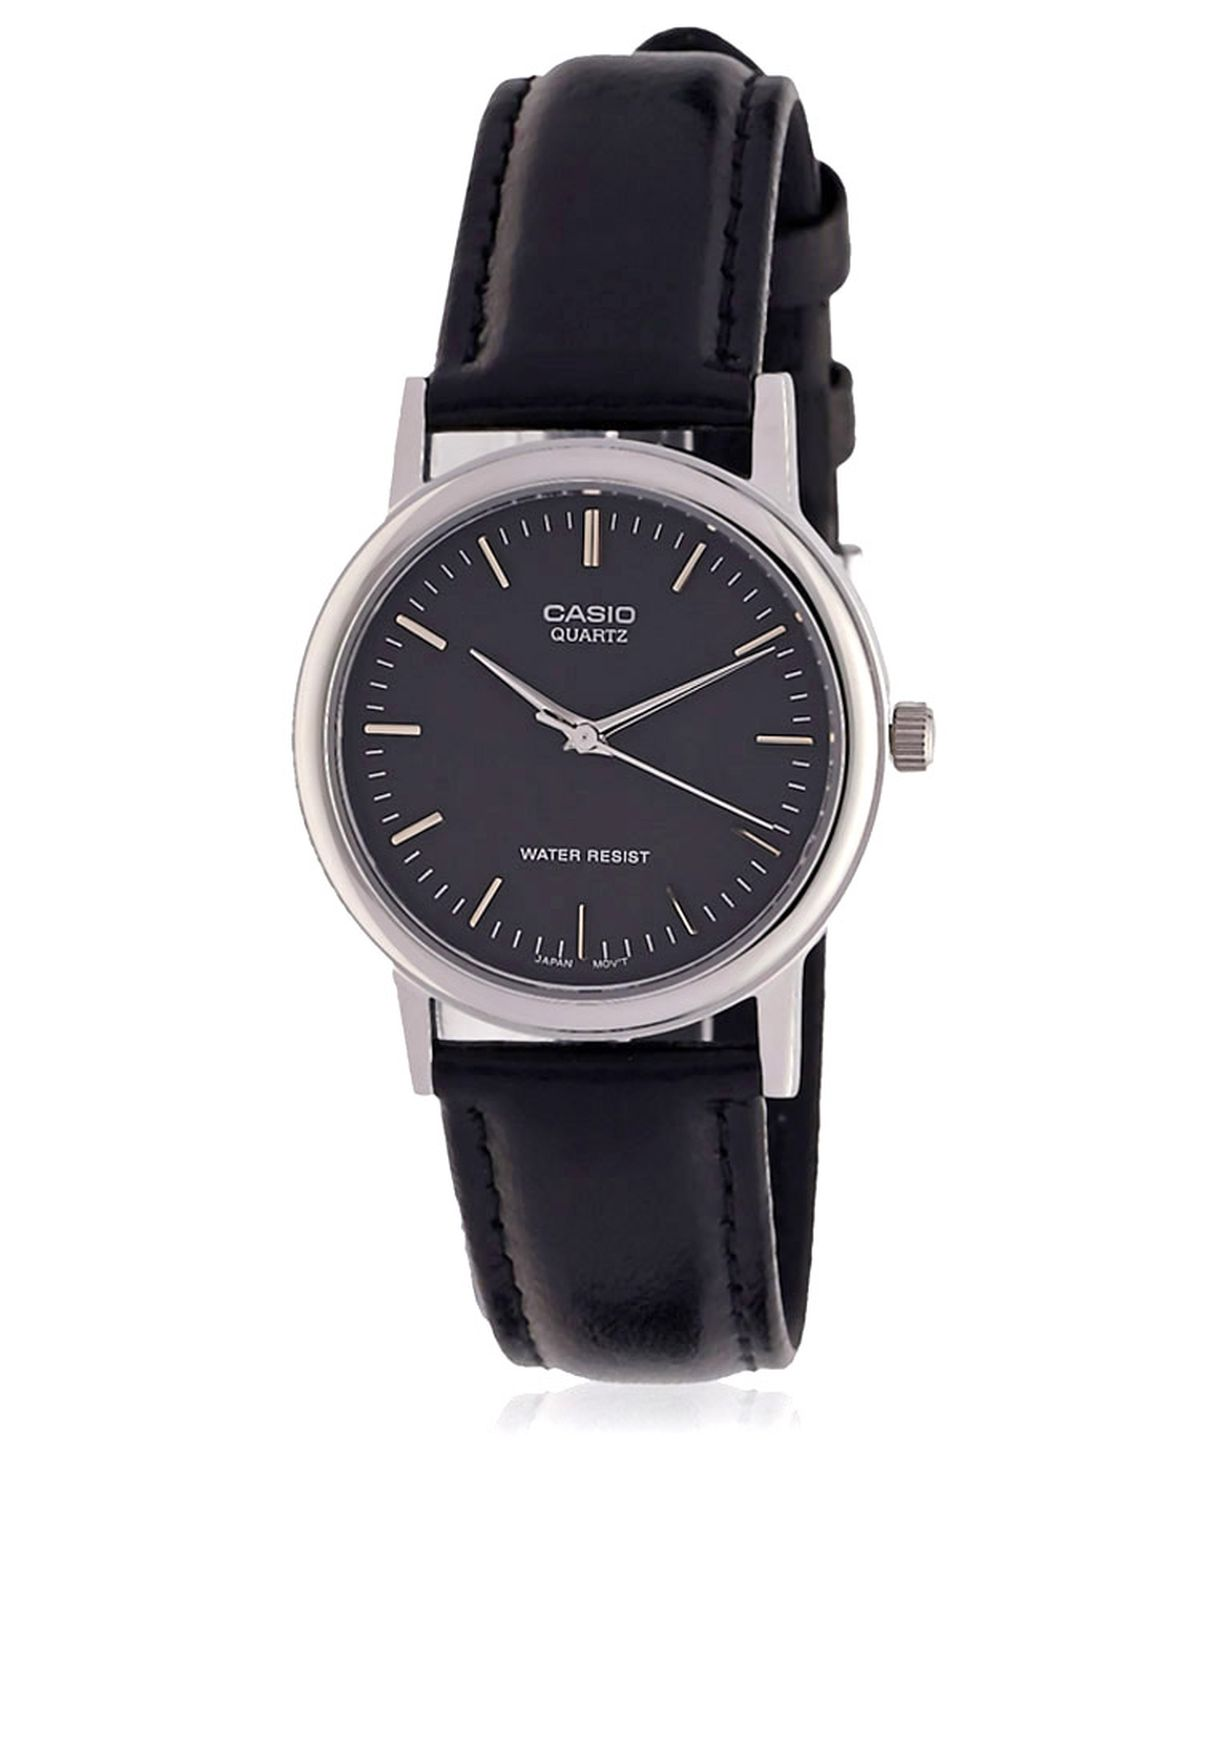 99f86cd4e تسوق ساعة يد أنالوج ماركة كاسيو لون أسود في عمان - CA511AC24OPR